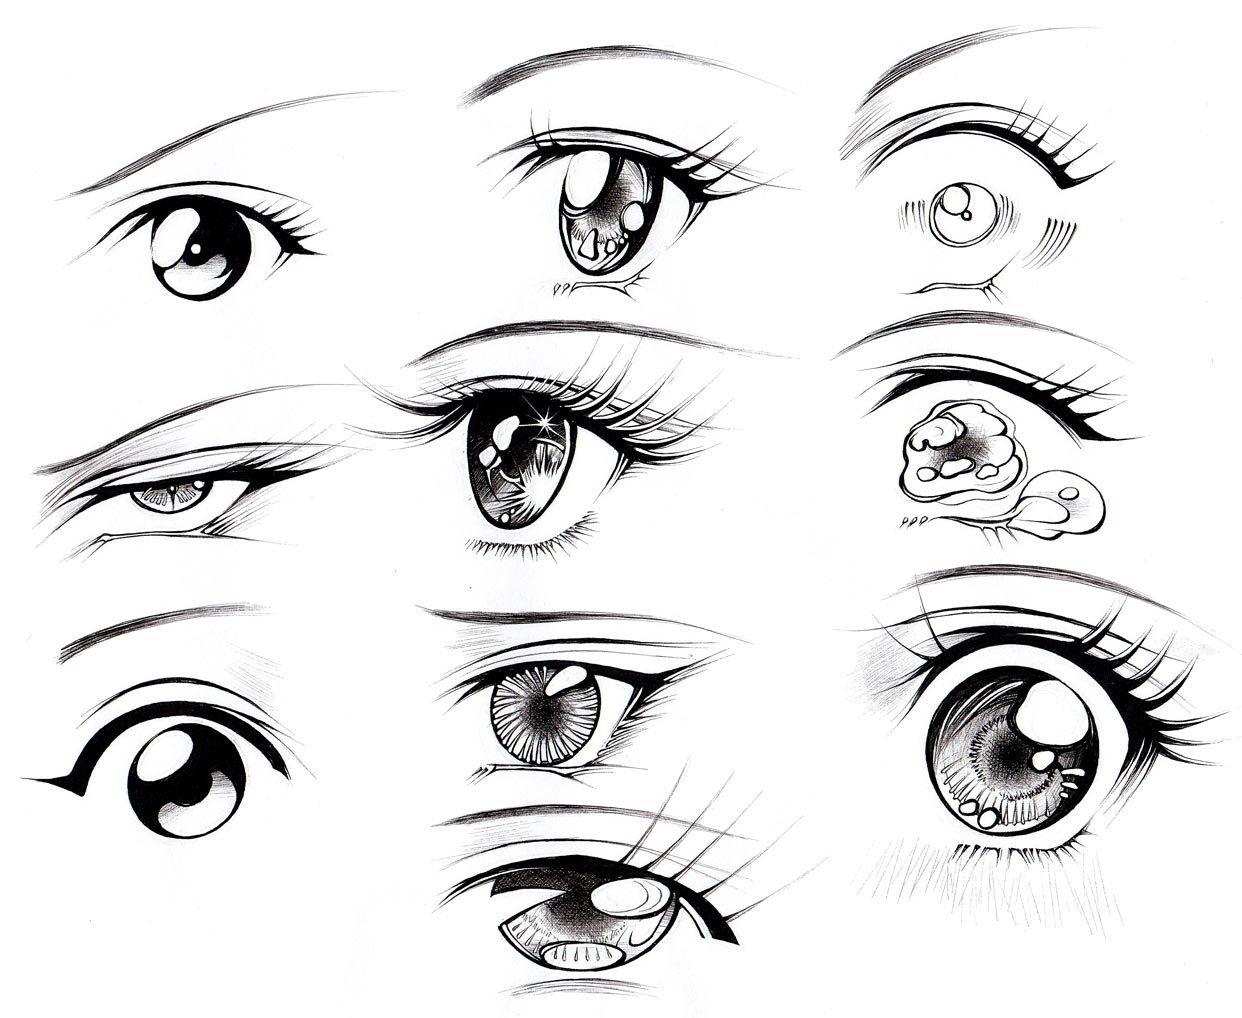 1242x1018 How To Draw Female Eyes (Part 2) Manga University Campus Store